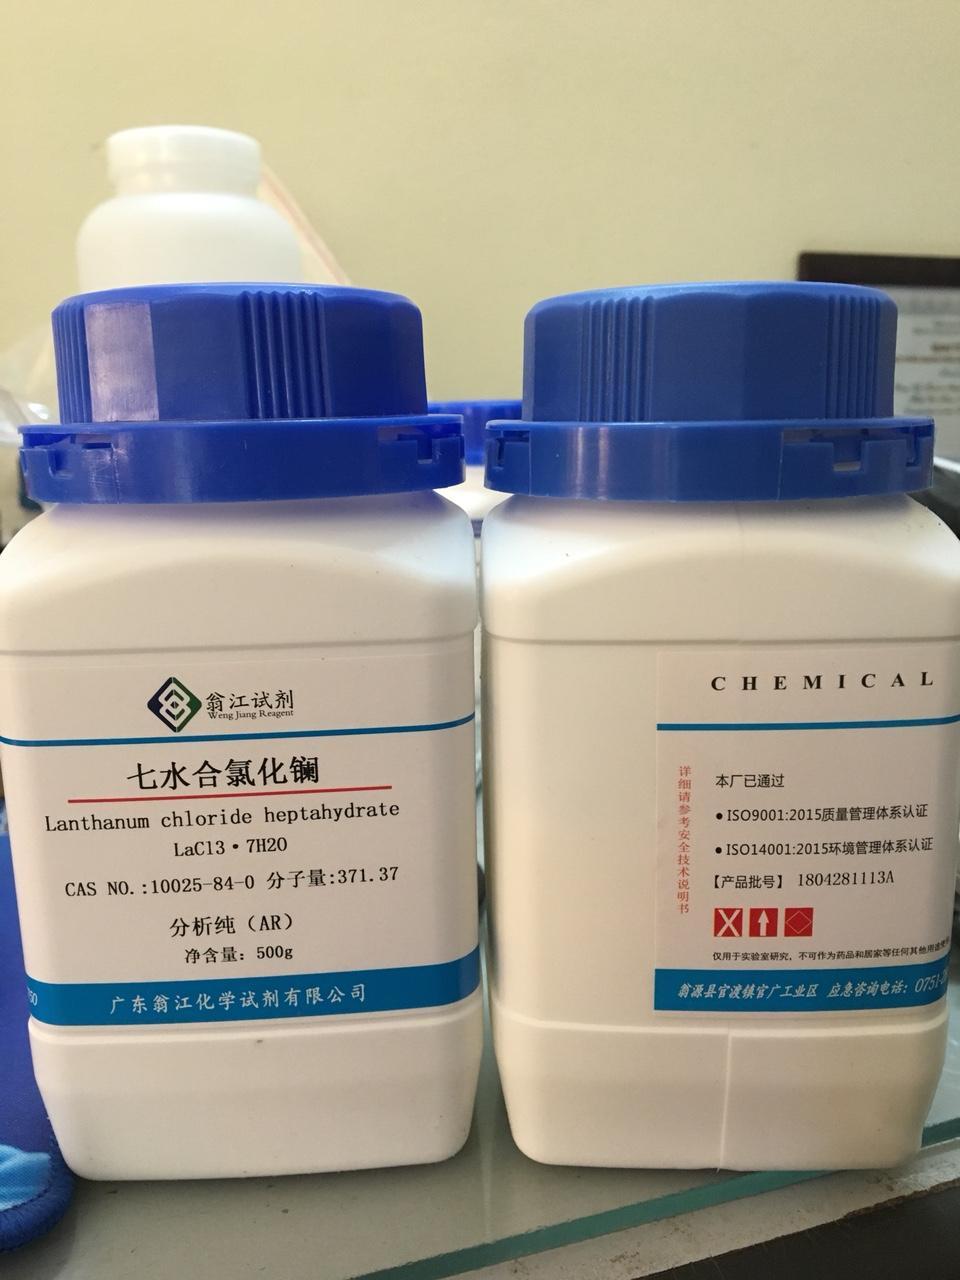 Hóa chất:  Lanthanum(III) chloride heptahydrate